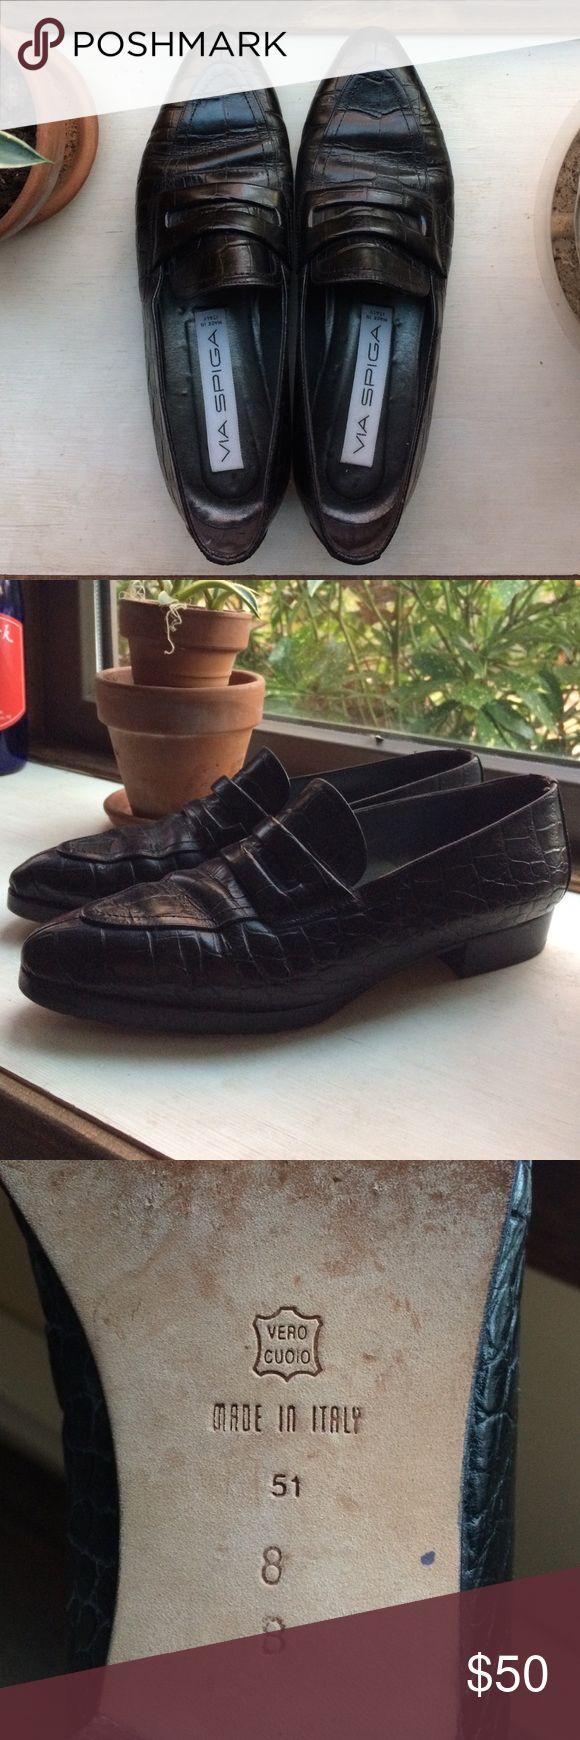 Via Spiga Loafers Women's size 8-Italian leather-Pointed-toe Via Spiga Shoes Flats & Loafers